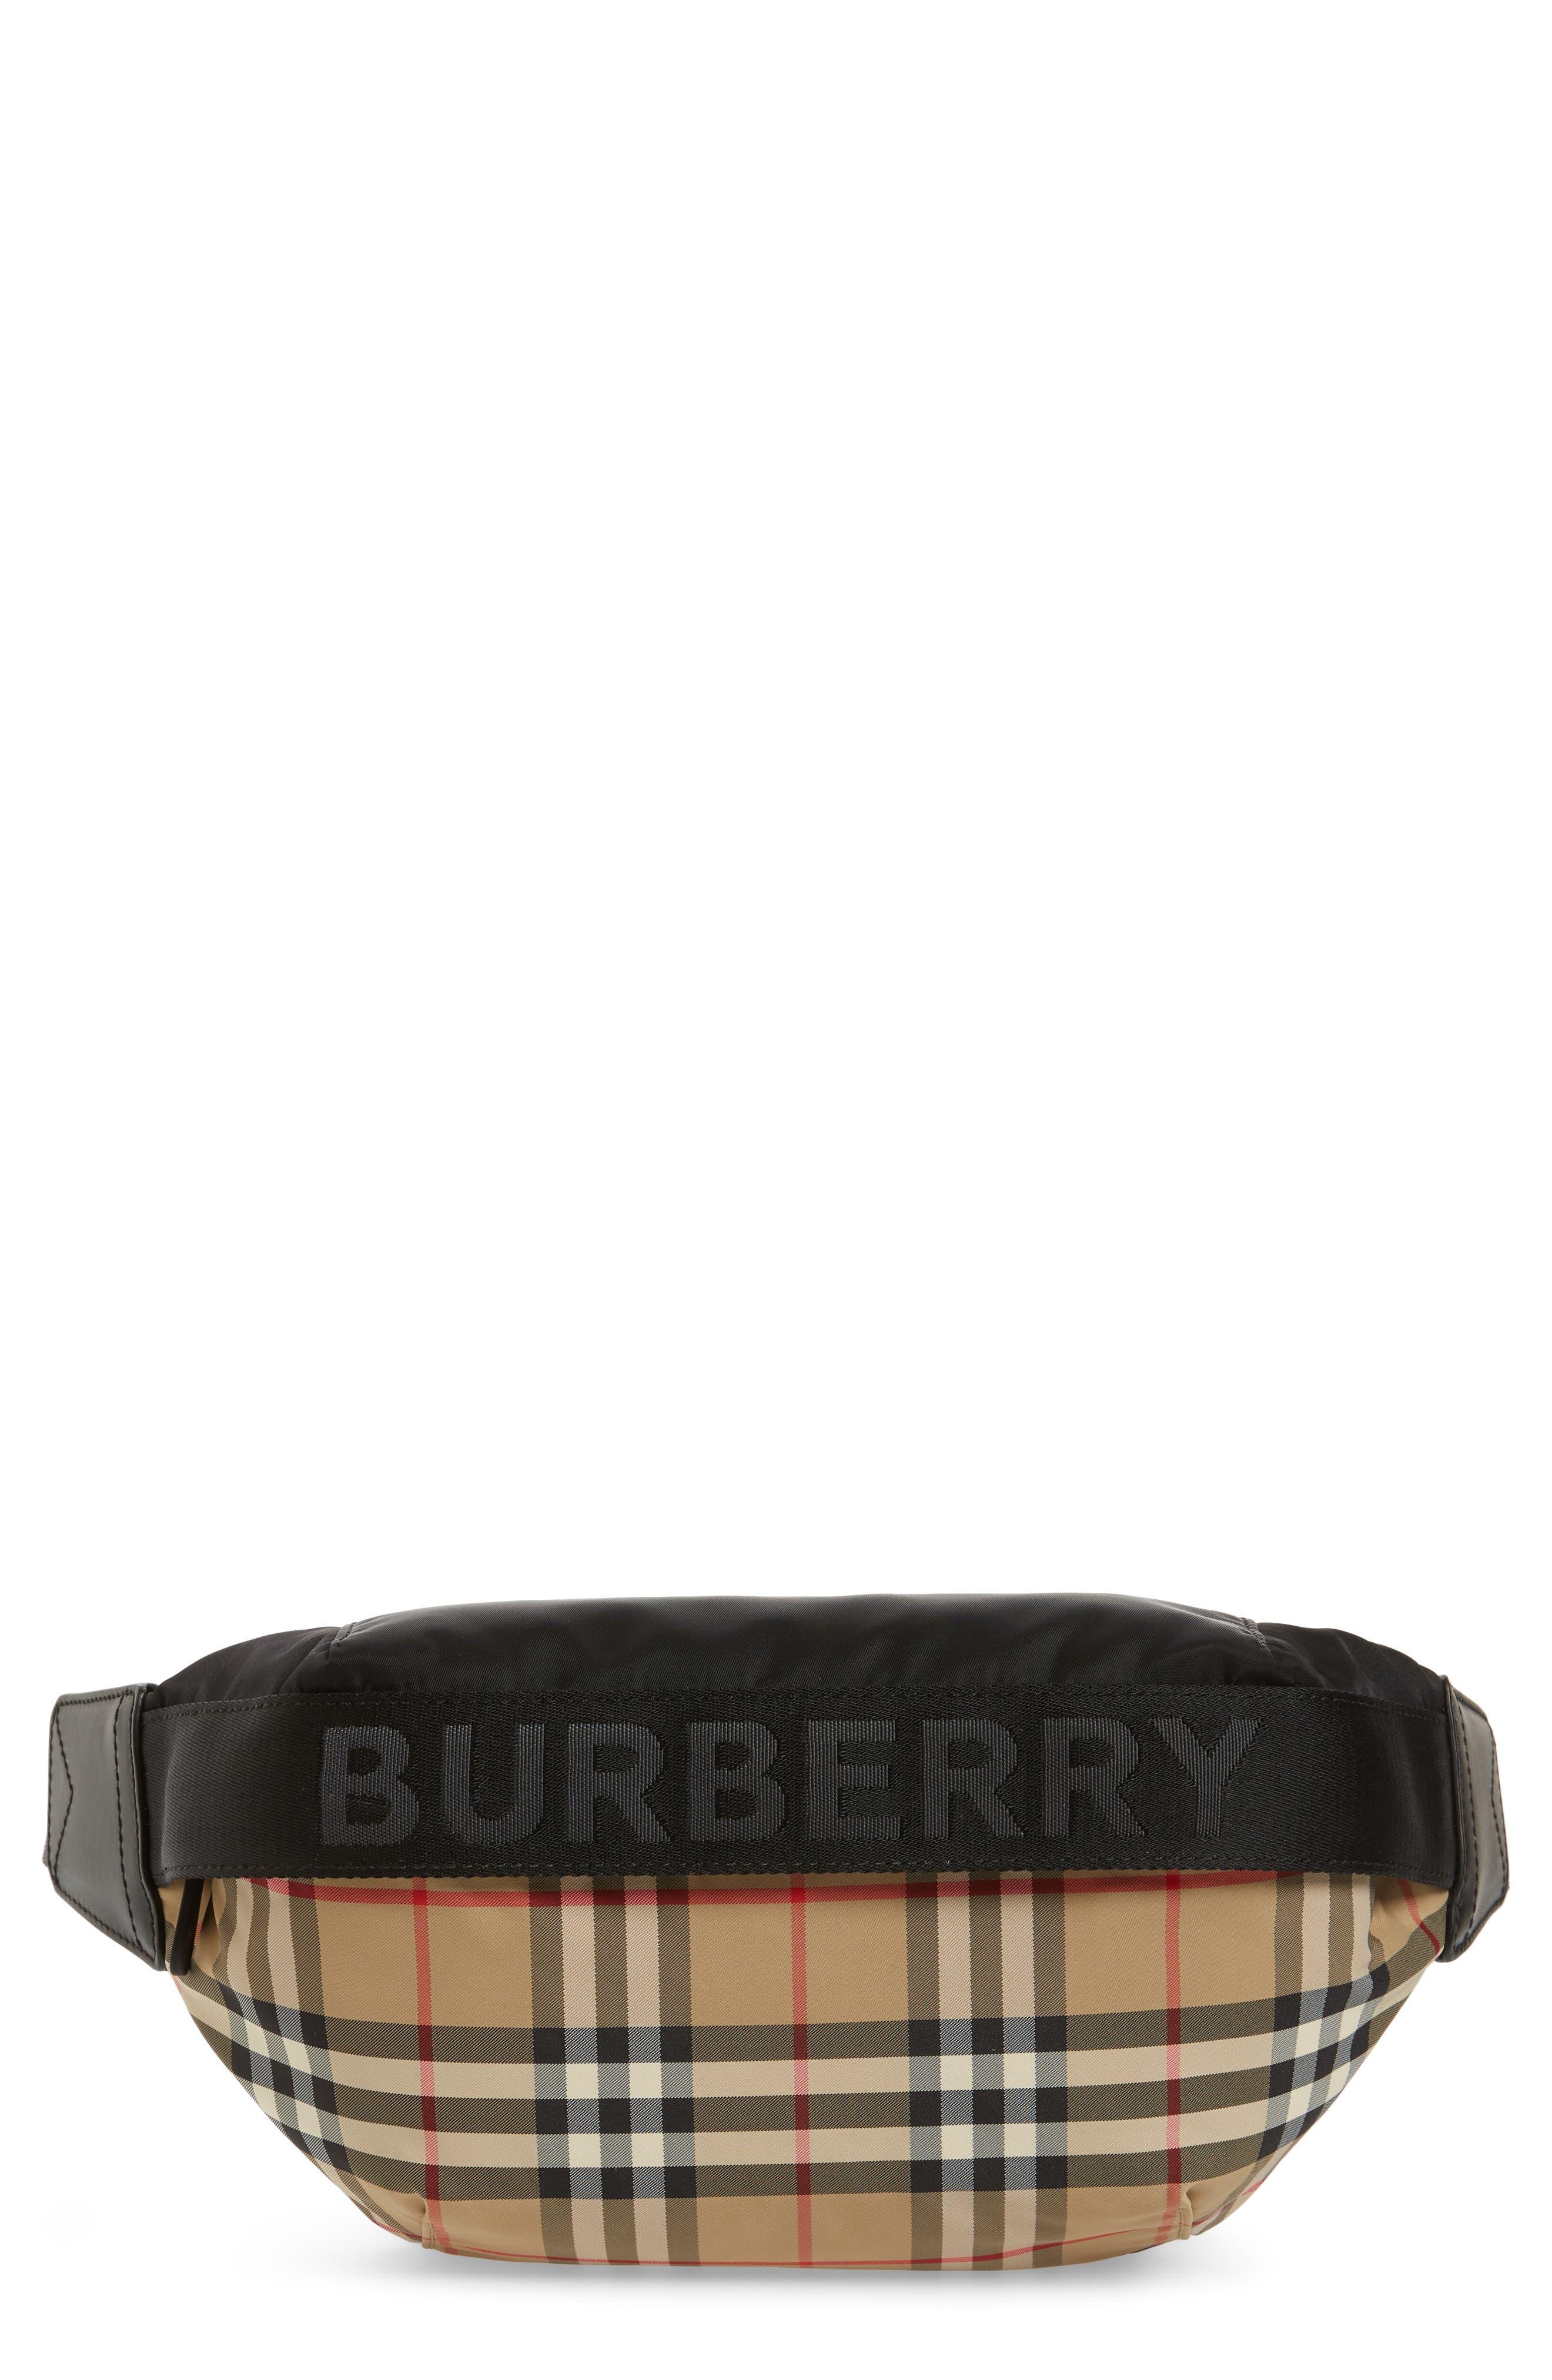 BURBERRY,                             Burberrry Medium Sonny Vintage Check Belt Bag,                             Main thumbnail 1, color,                             ARCHIVE BEIGE